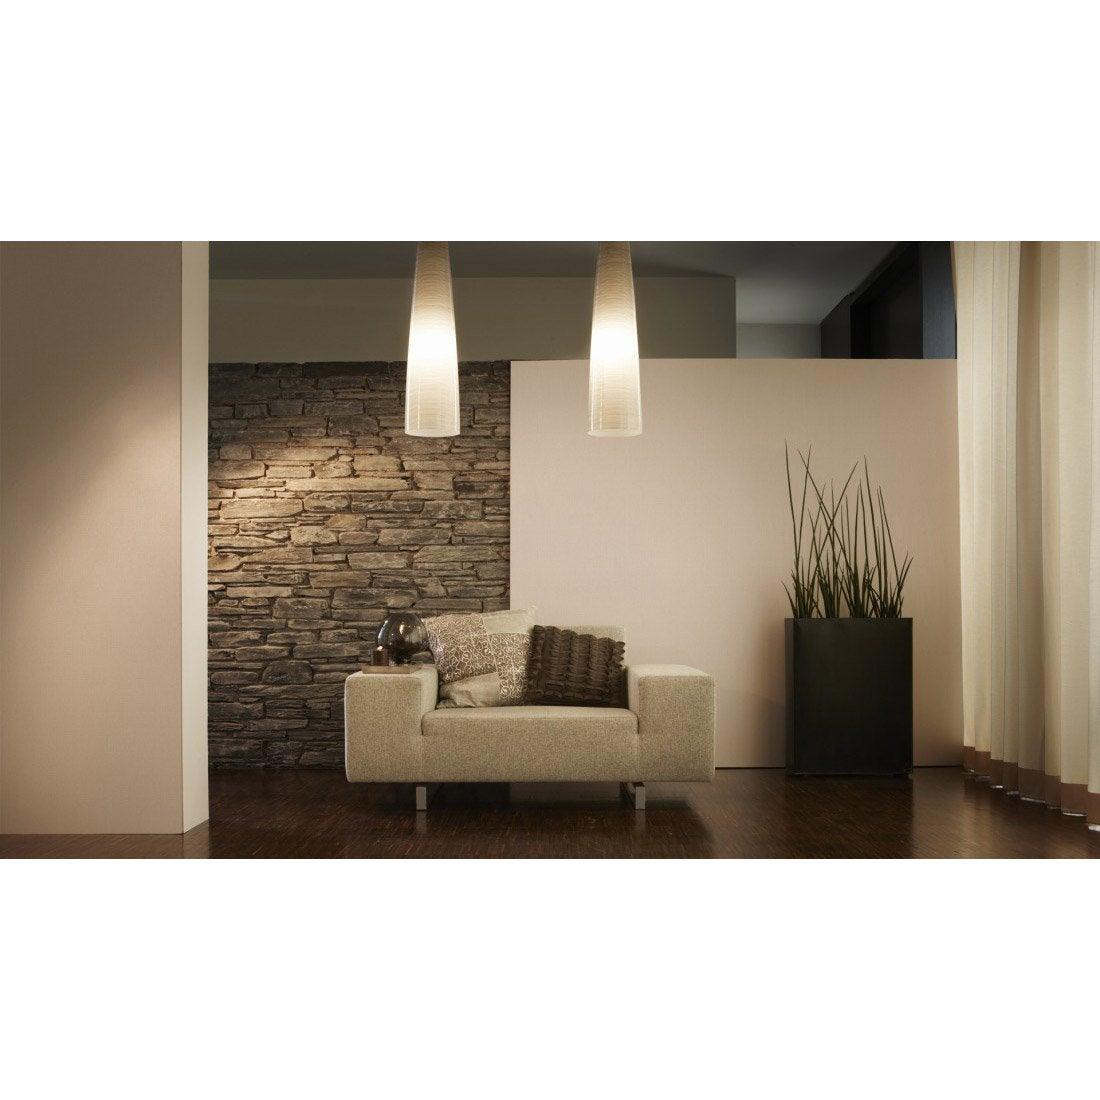 papier peint intiss baltic beige clair leroy merlin. Black Bedroom Furniture Sets. Home Design Ideas